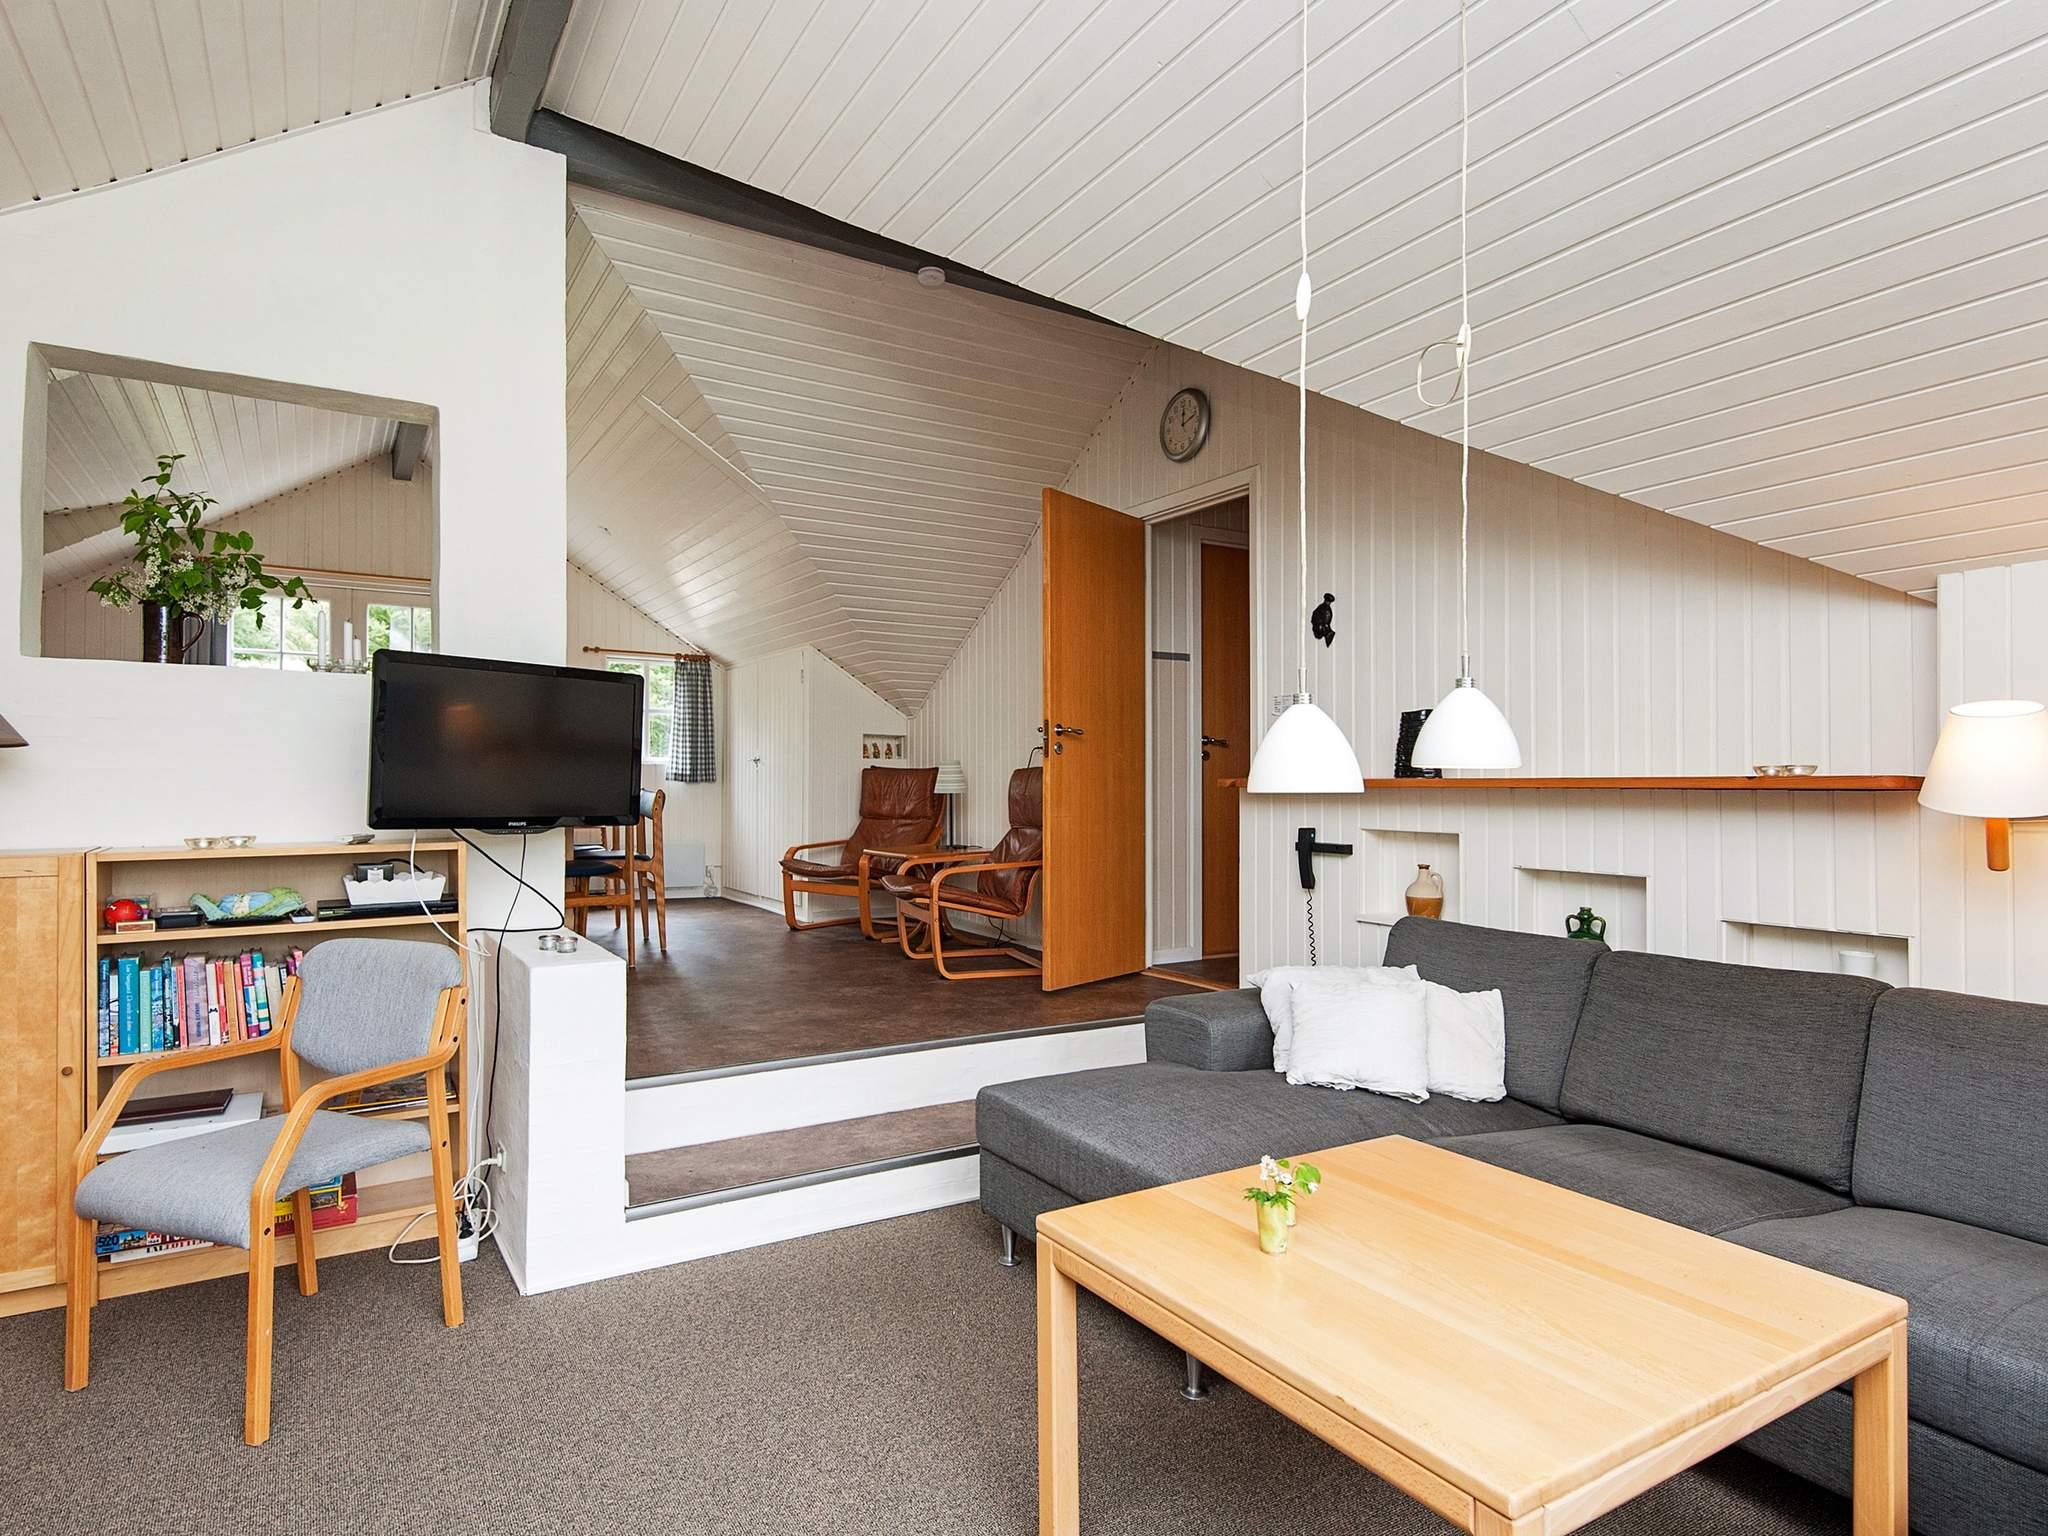 Ferienhaus Ry (83836), Ry, , Ostjütland, Dänemark, Bild 10